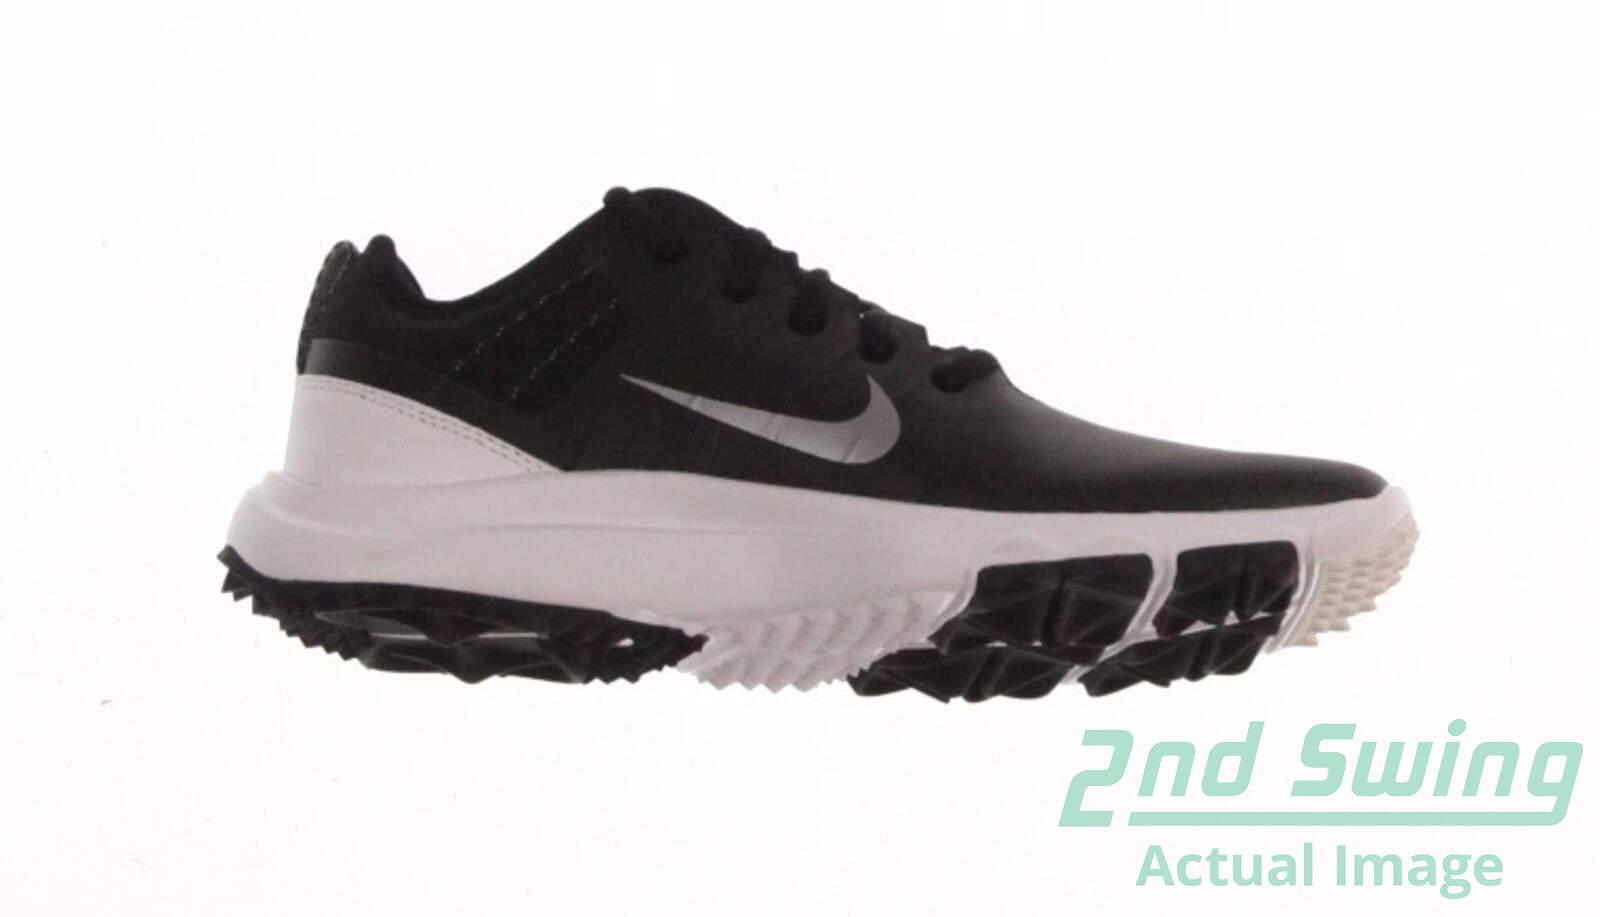 bd60069d84b9 New Womens Golf Shoe Nike FI Impact 2 9.5 Black White MSRP  170 776093 002  - Golf Footwear